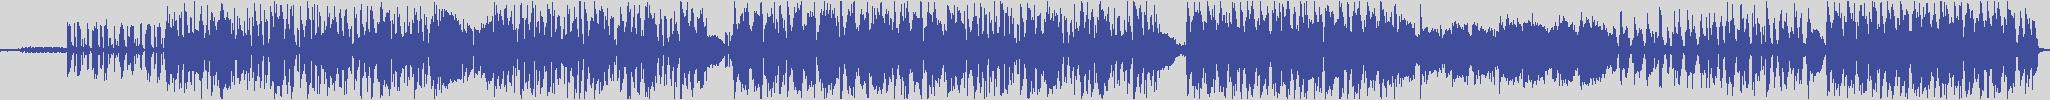 gold_hit_records [GHR005] Lorenzo Mattiussi - Run Away [Radio Edit] audio wave form